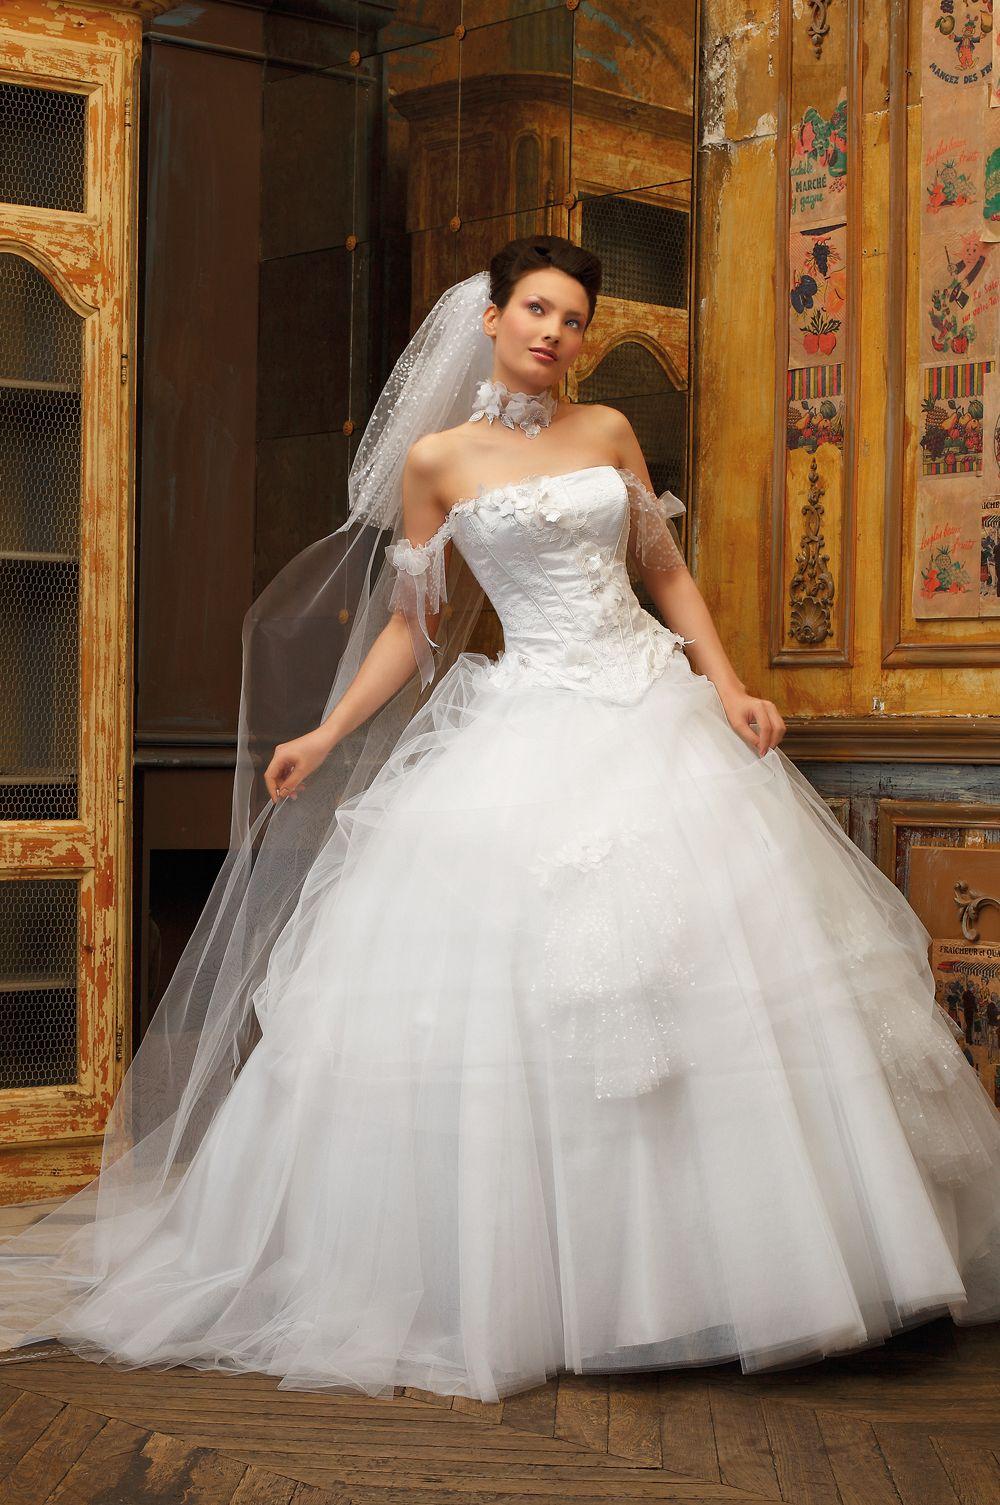 lace corset wedding dress Eli Shay Wedding Dress Collections Coliseum White Calais lace corset trimmed with appliques